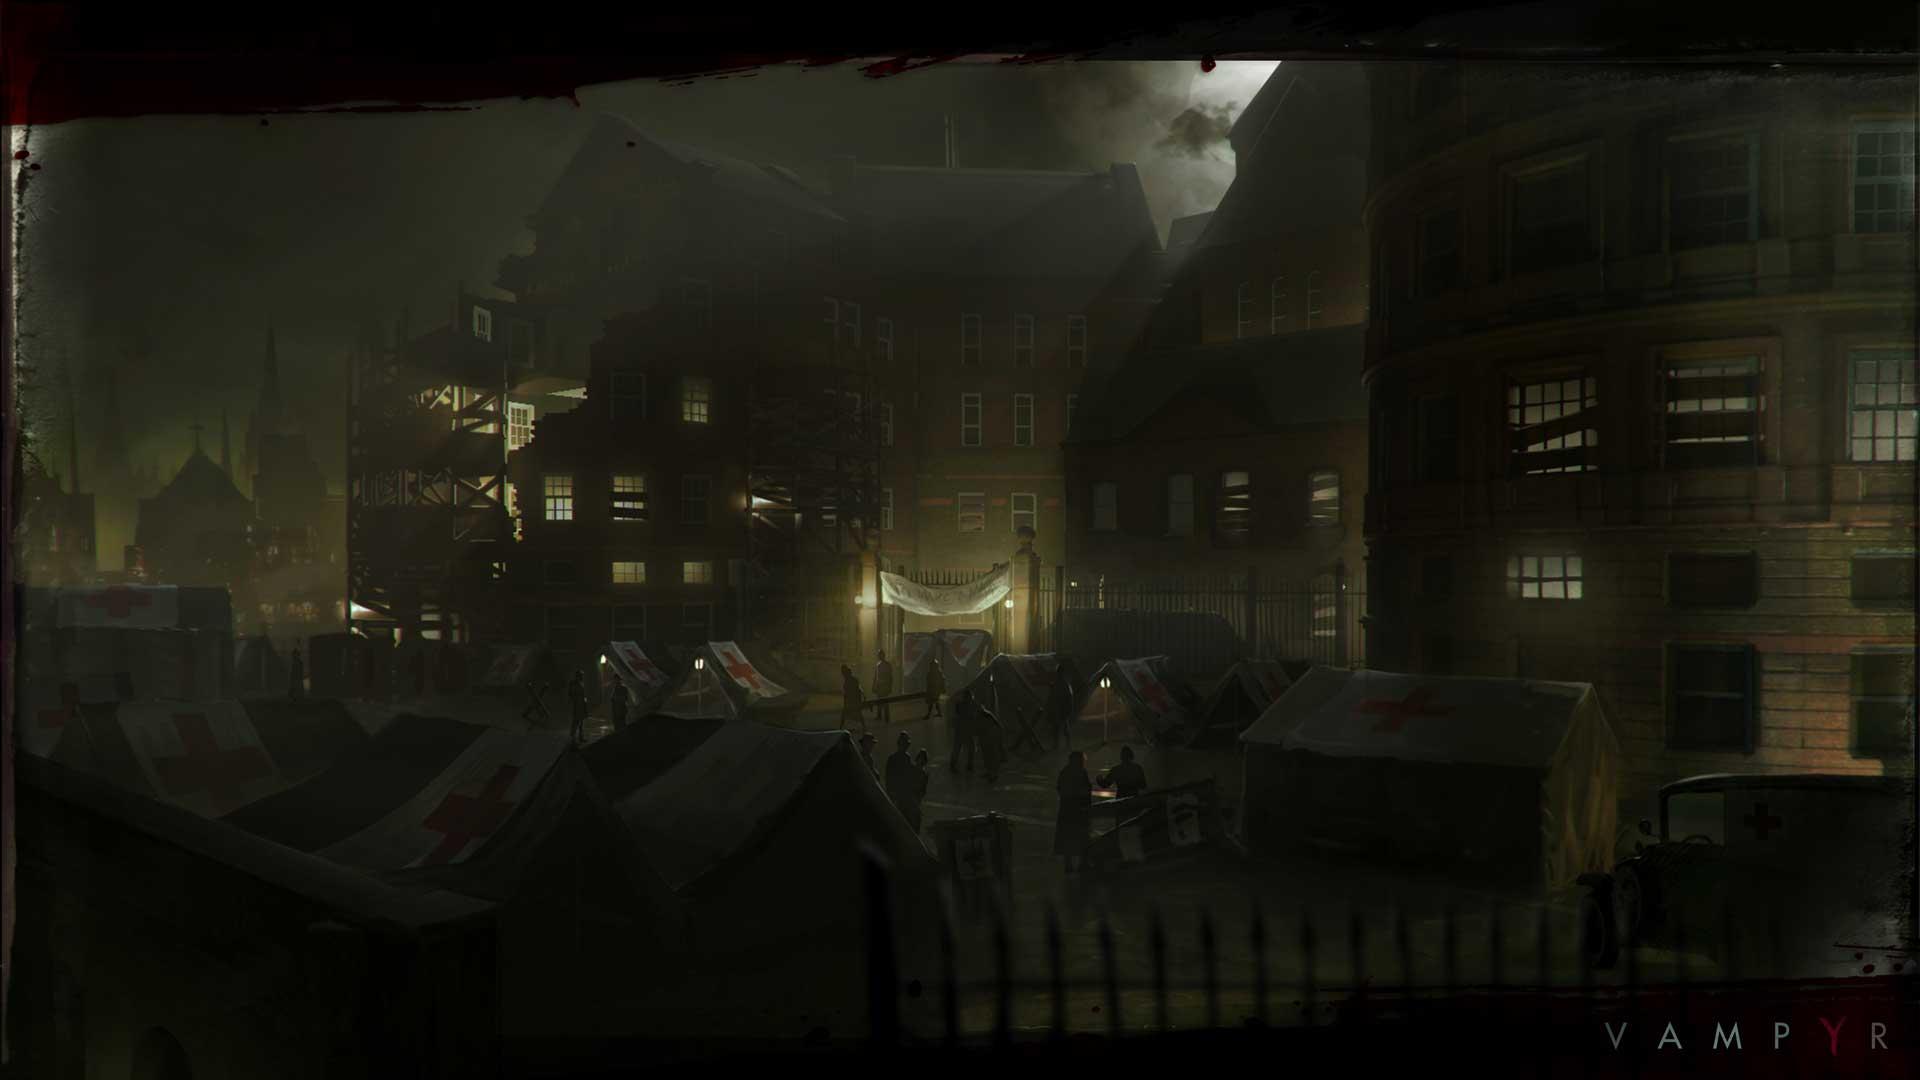 Vampyr Trailer Image